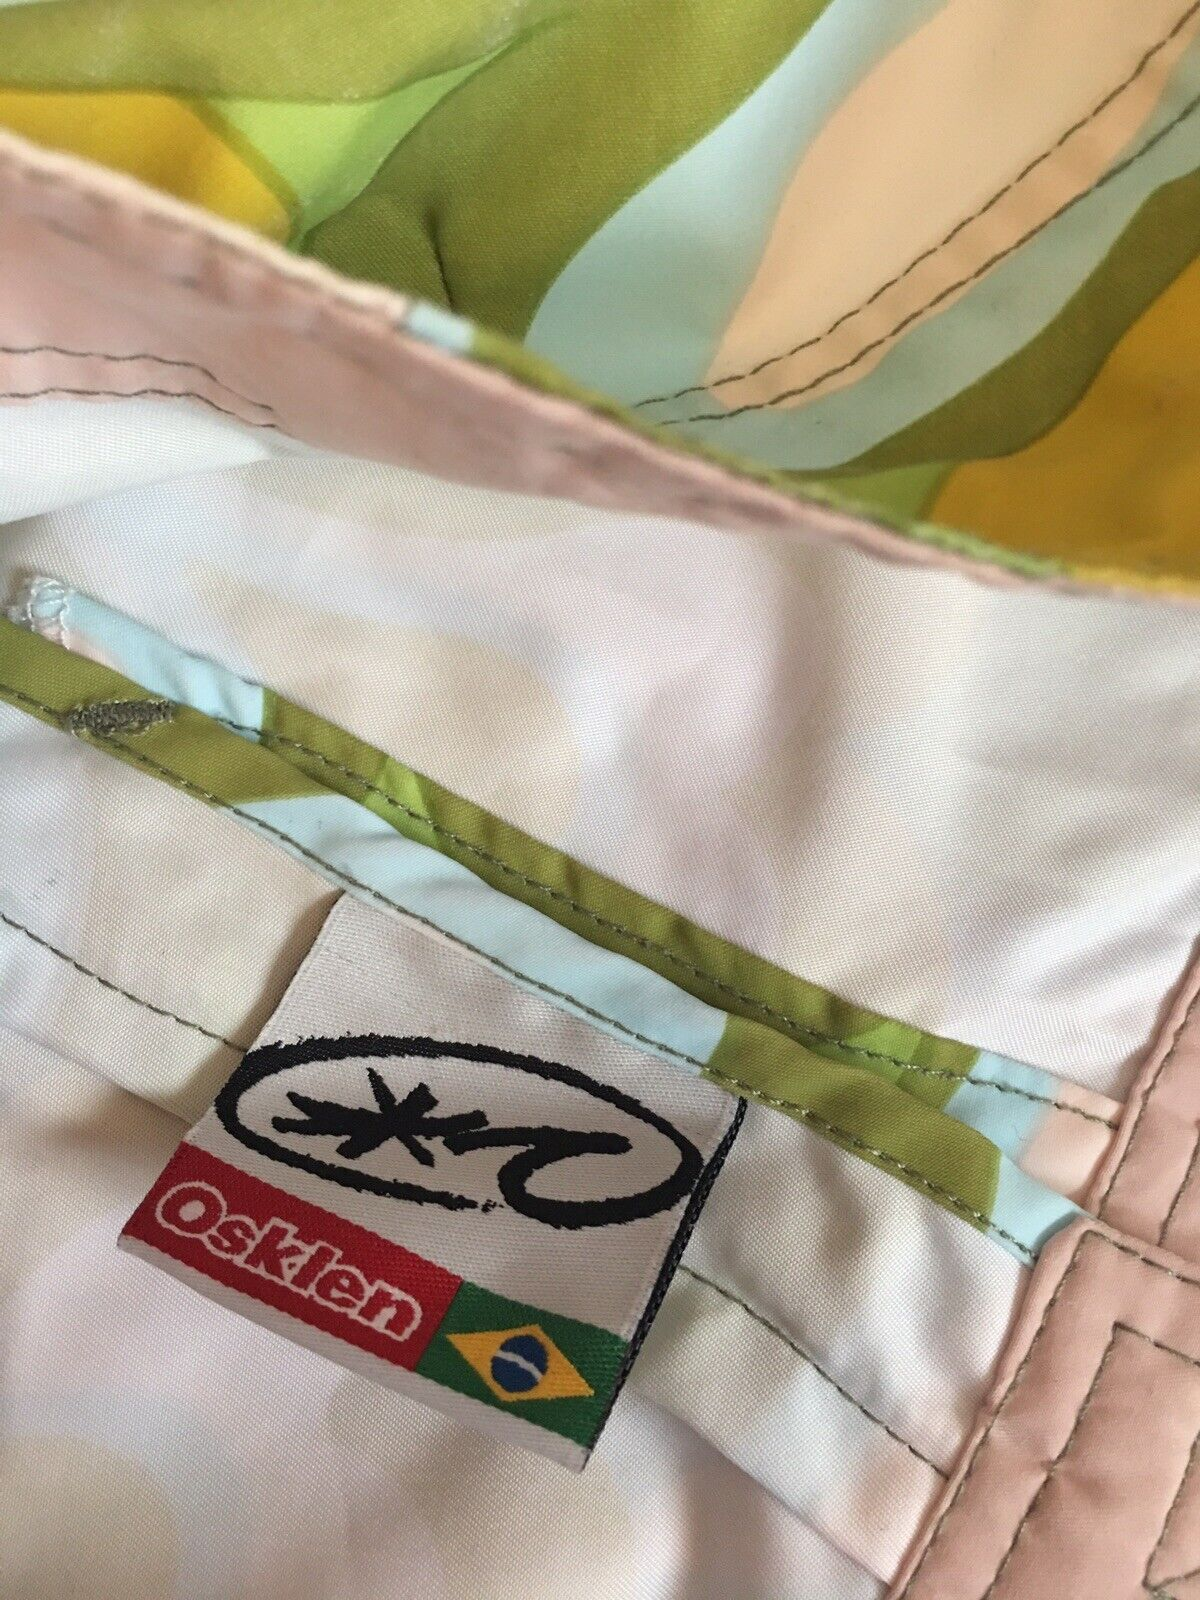 Osklen Brazil Multicolore Grafica Nuoto Nuoto Nuoto Tavola da Surf Frilly Pantaloncini Donna UK8 EU36 ab9a14